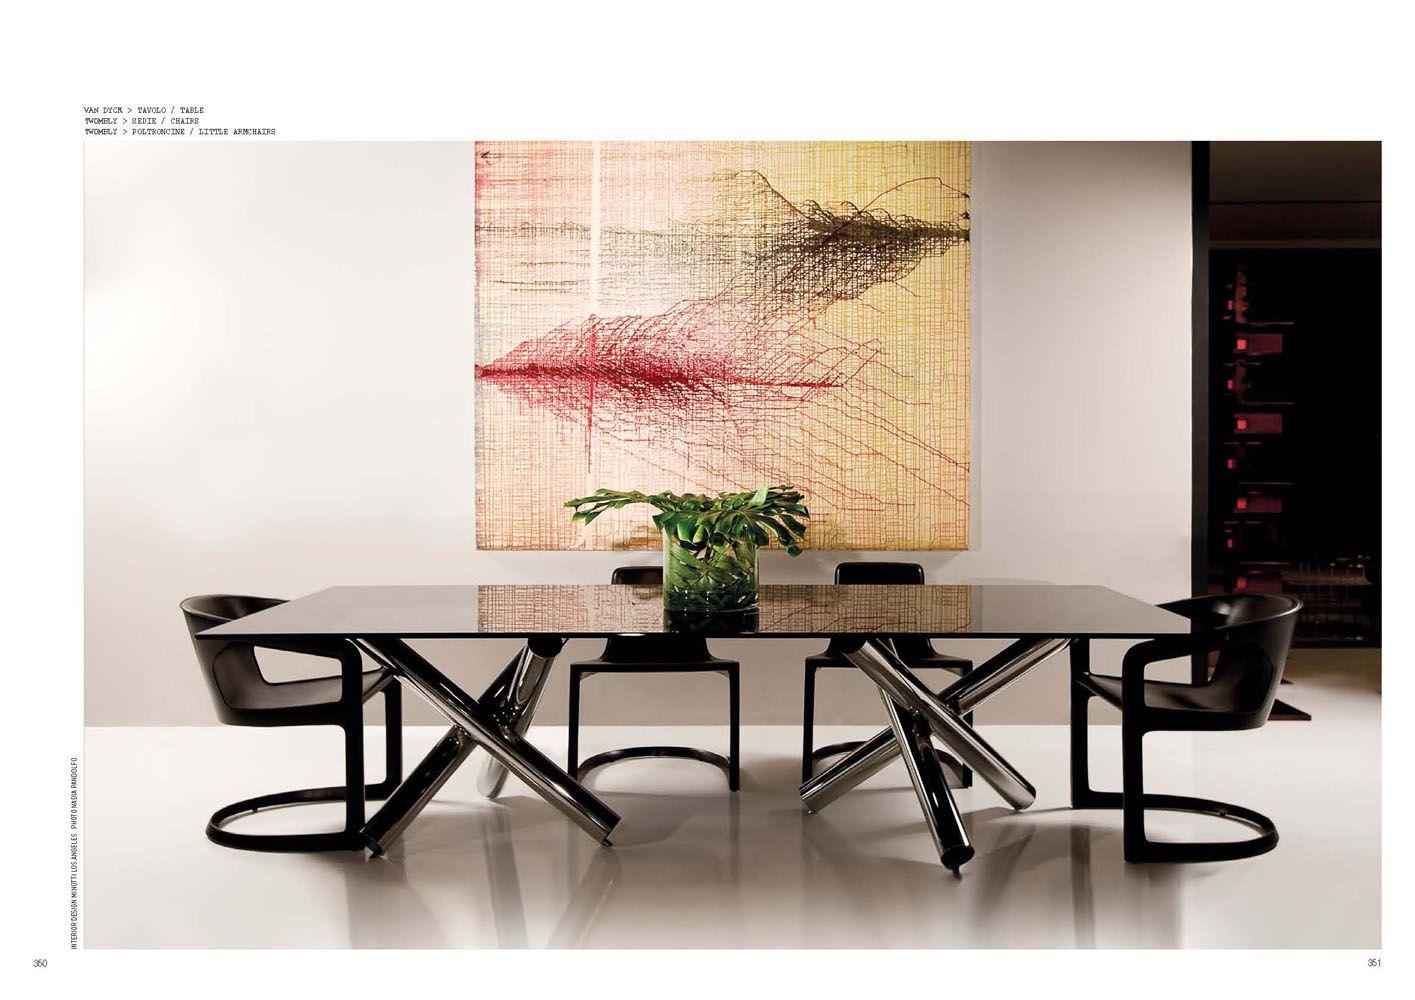 Minotti - Interiors all over the World - Dedece Blog   Dedece Blog